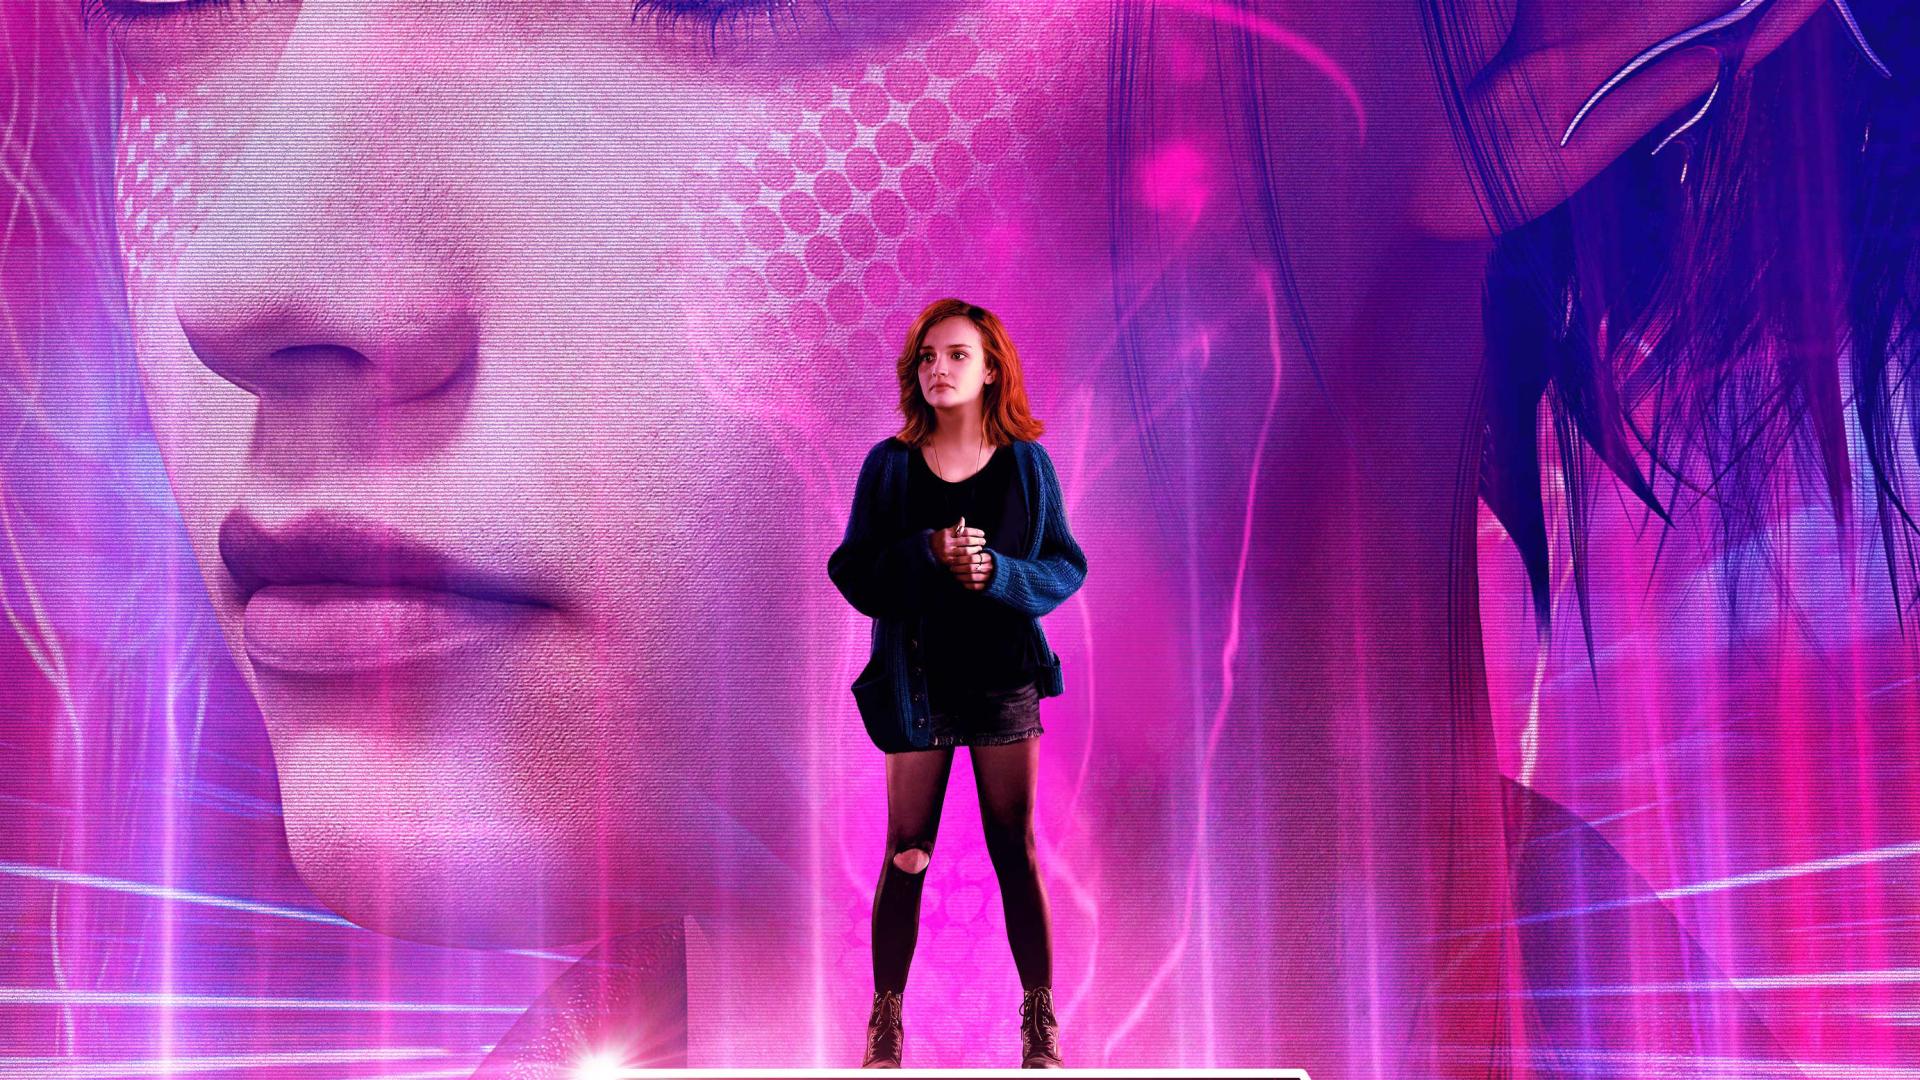 Olivia Cooke As Art3mis Ready Player One Full Hd 2k Wallpaper